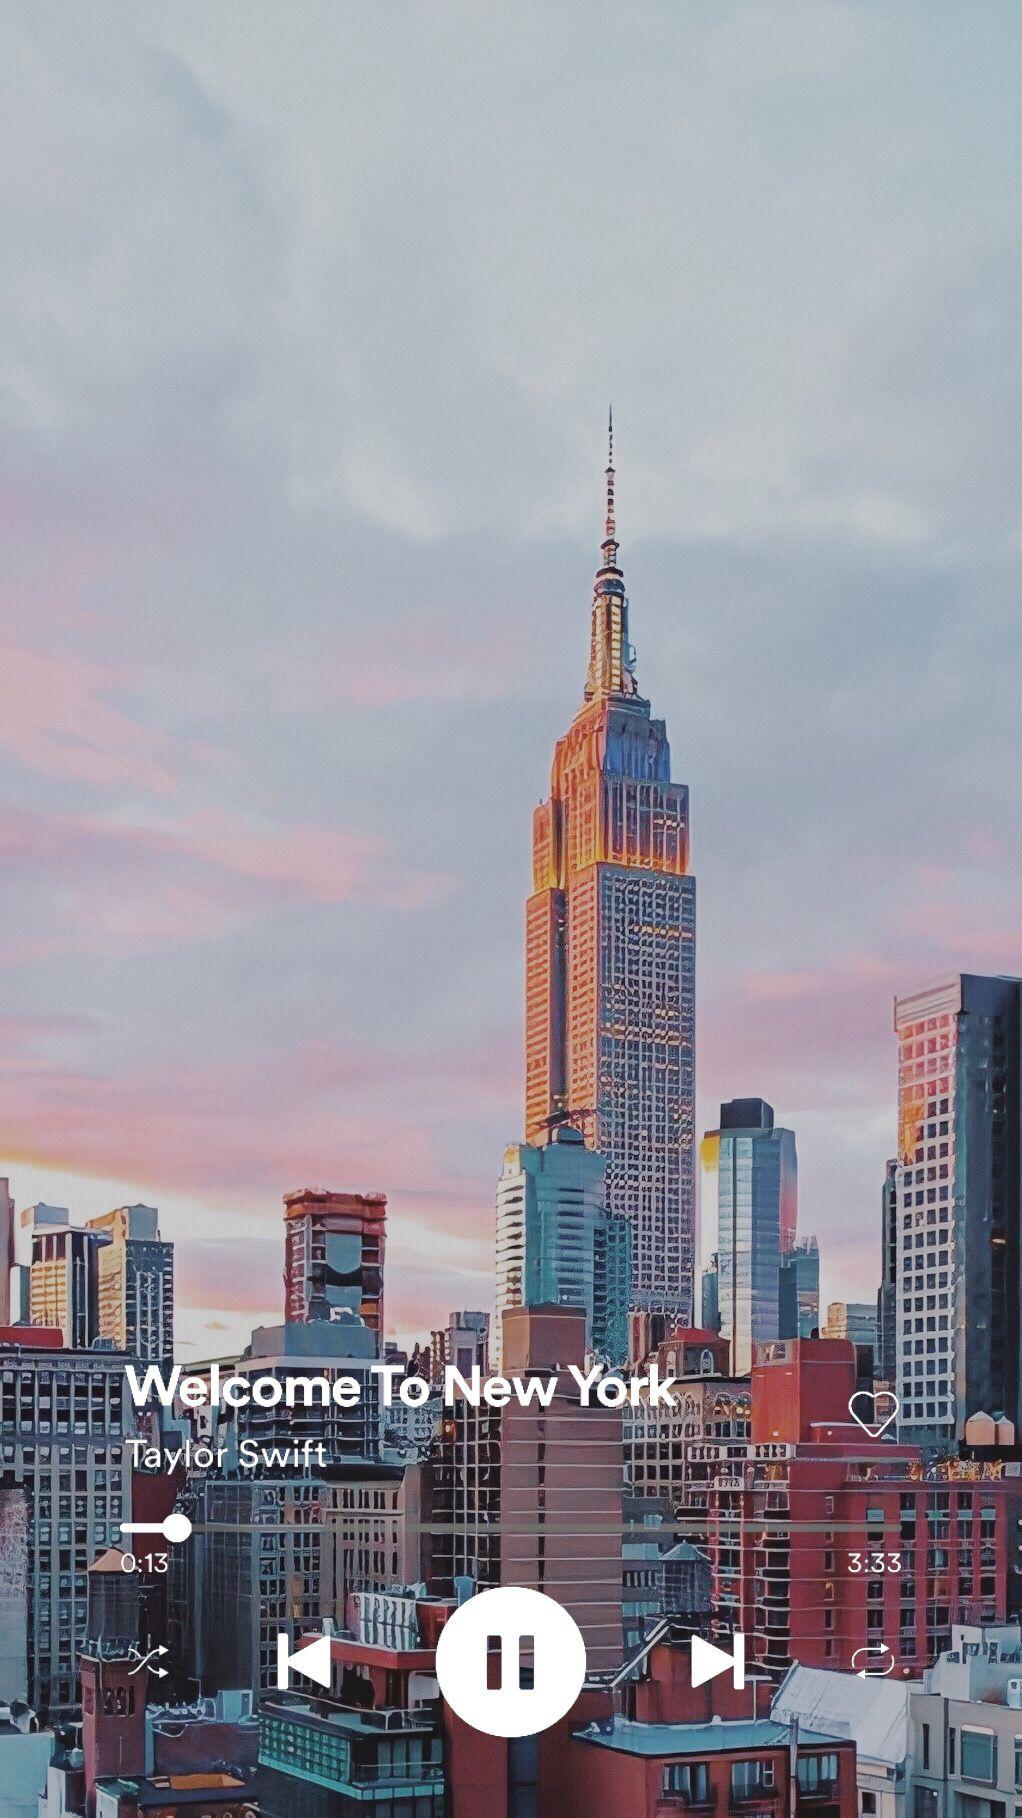 Taylor Swift Lockscreens Like Or Reblog If You New York Wallpaper City Aesthetic Sky Aesthetic Aesthetic new york iphone wallpaper